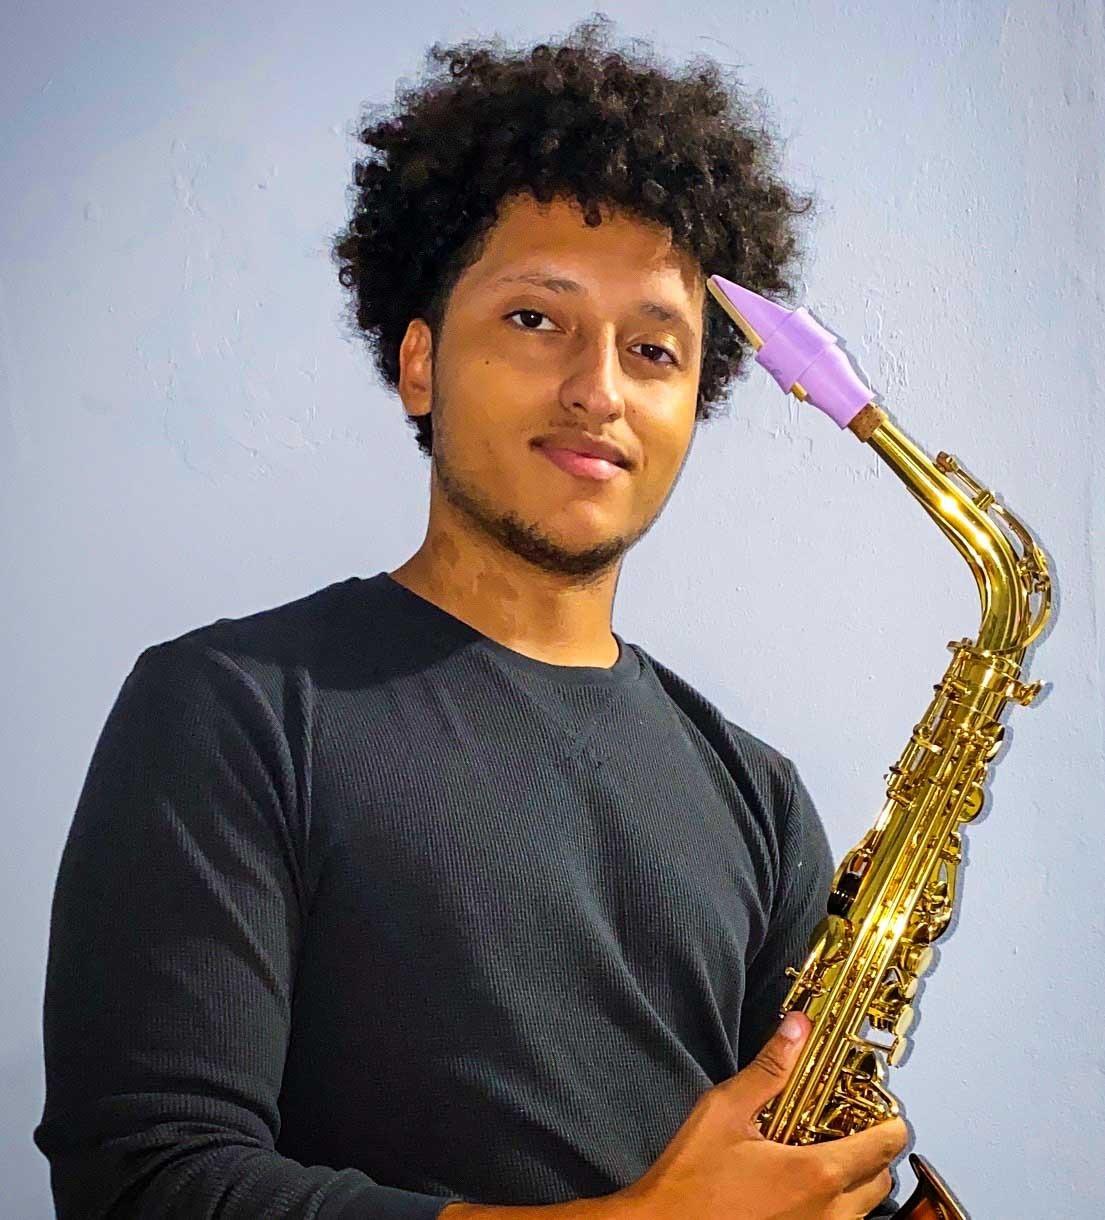 Saxologic joue un bec Syos au saxophone alto